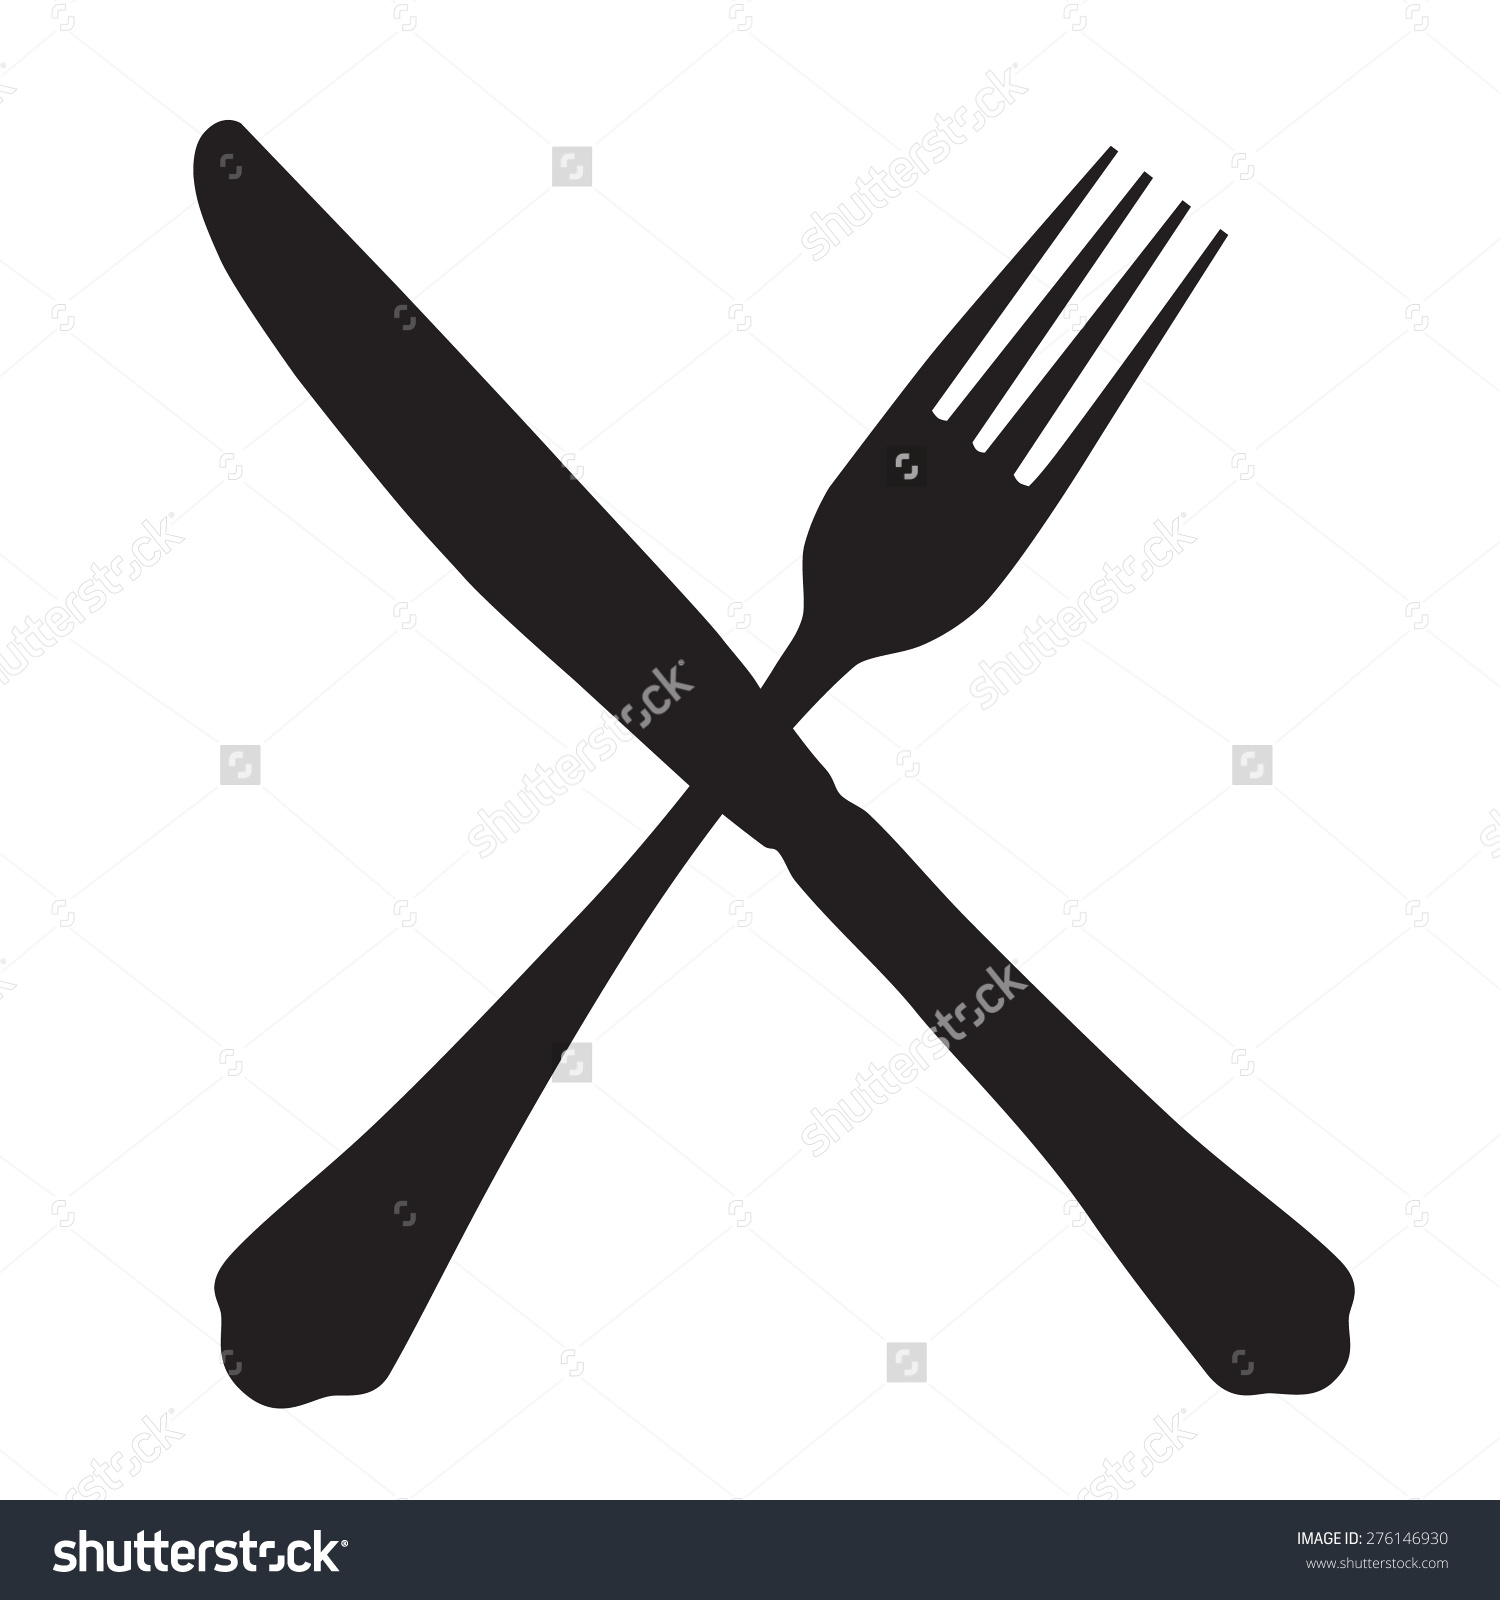 Black Silhouette Crossed Fork Knife Icon Stock Vector 276146930.